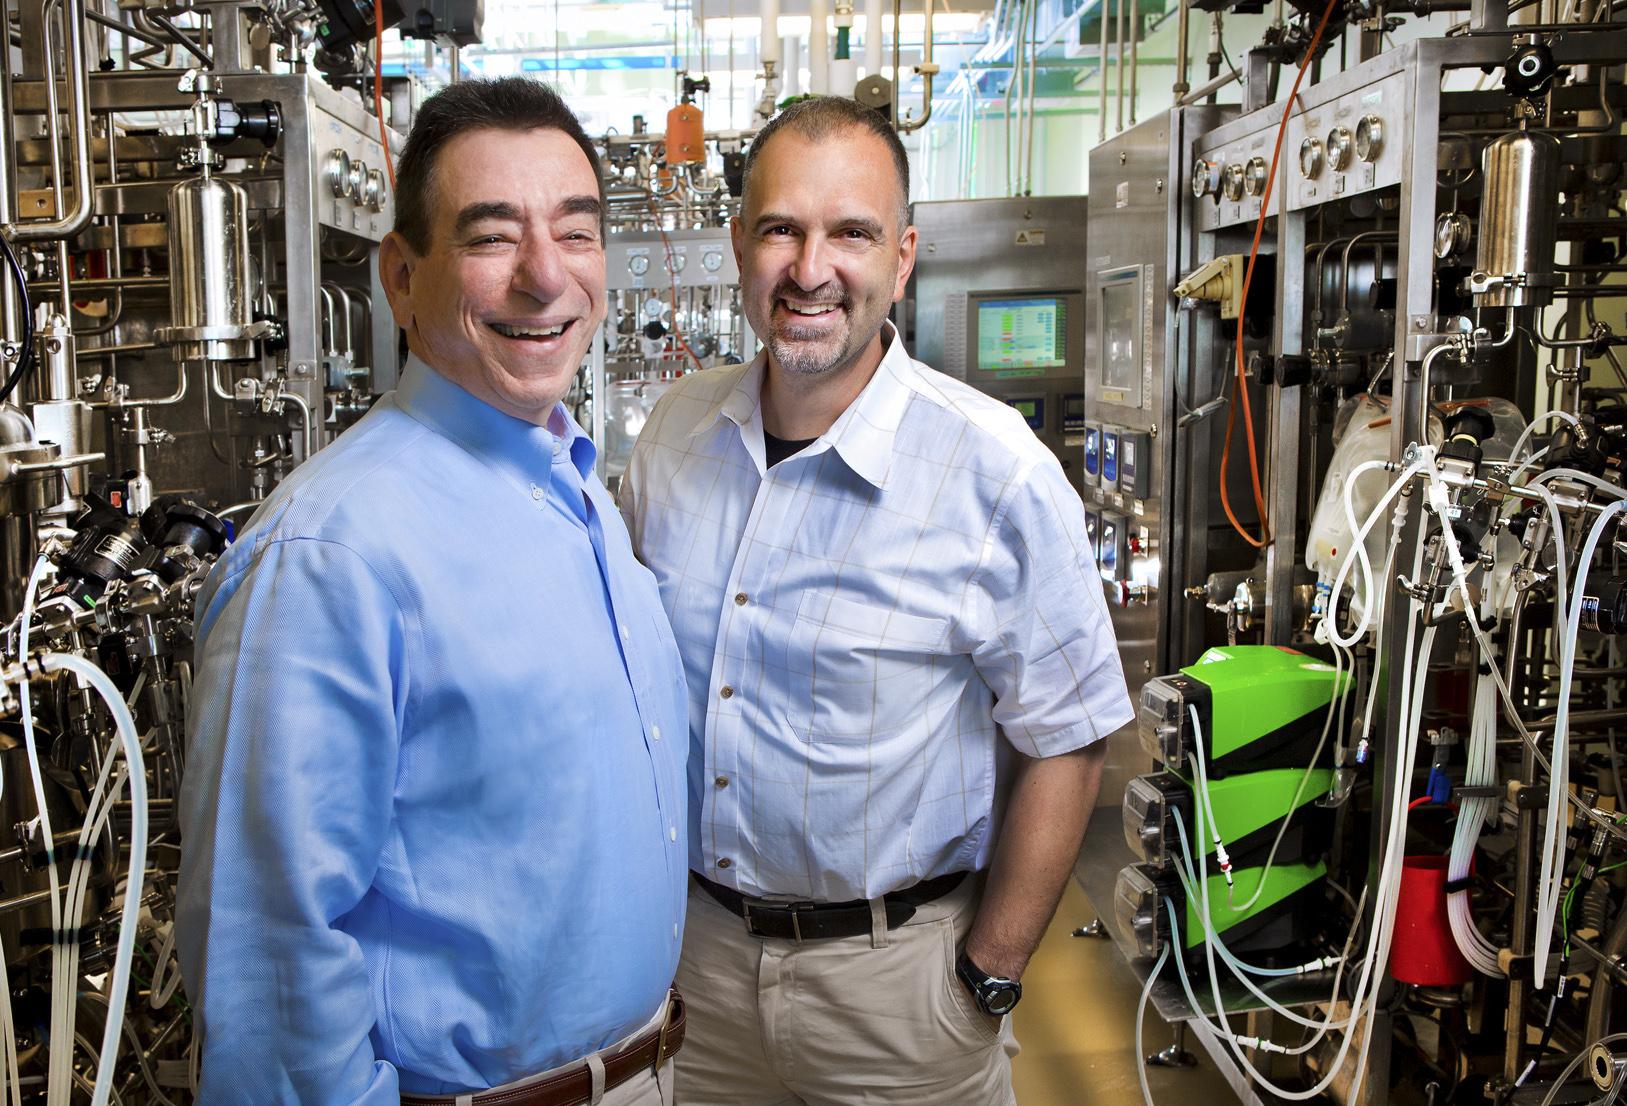 Len Schleifer + George Yancopoulos